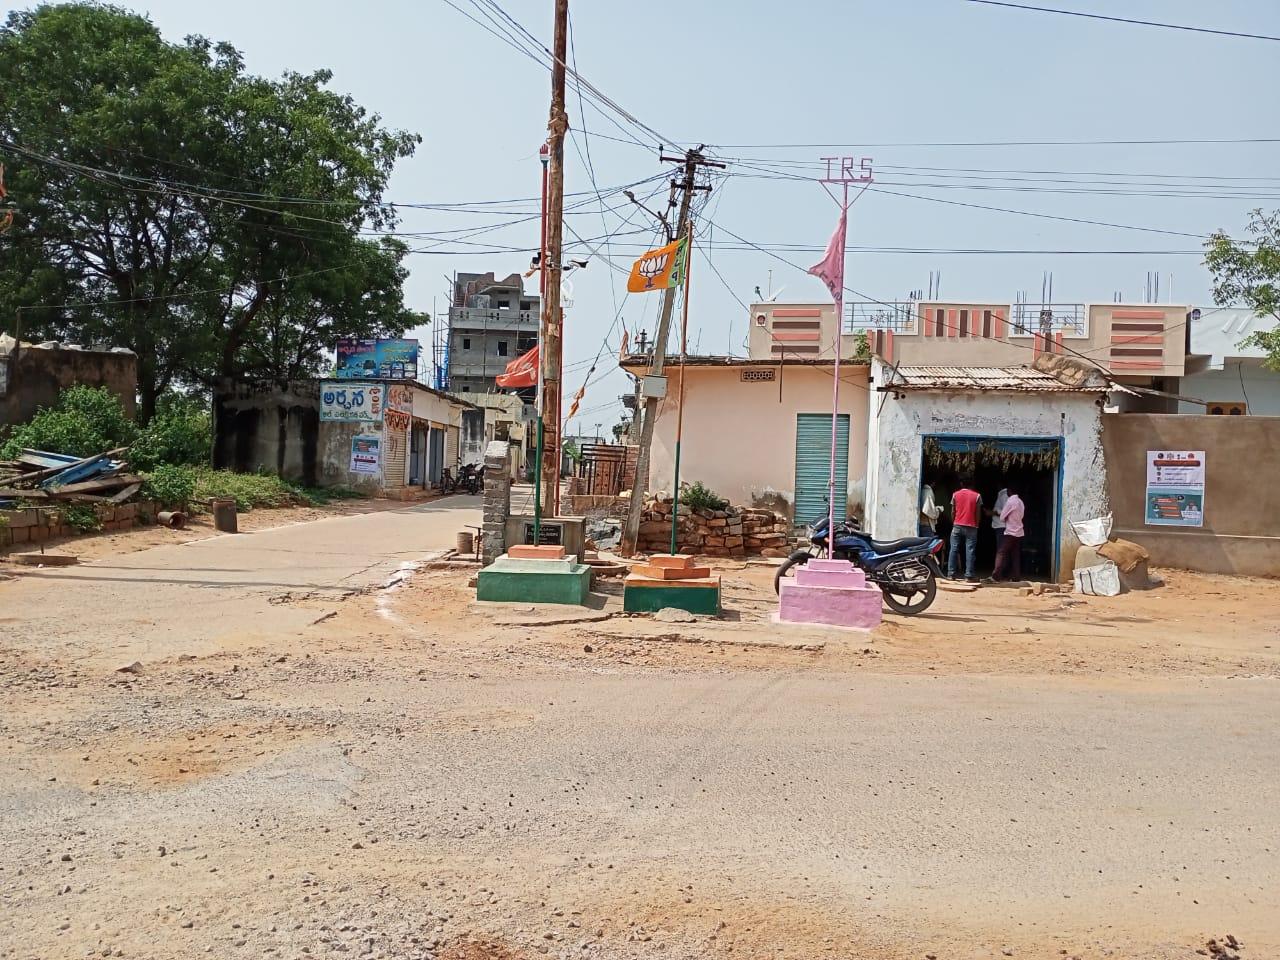 Janandolan campaign on COVID 19 – Gollapalli ward No.9 municipality, Shamshabad